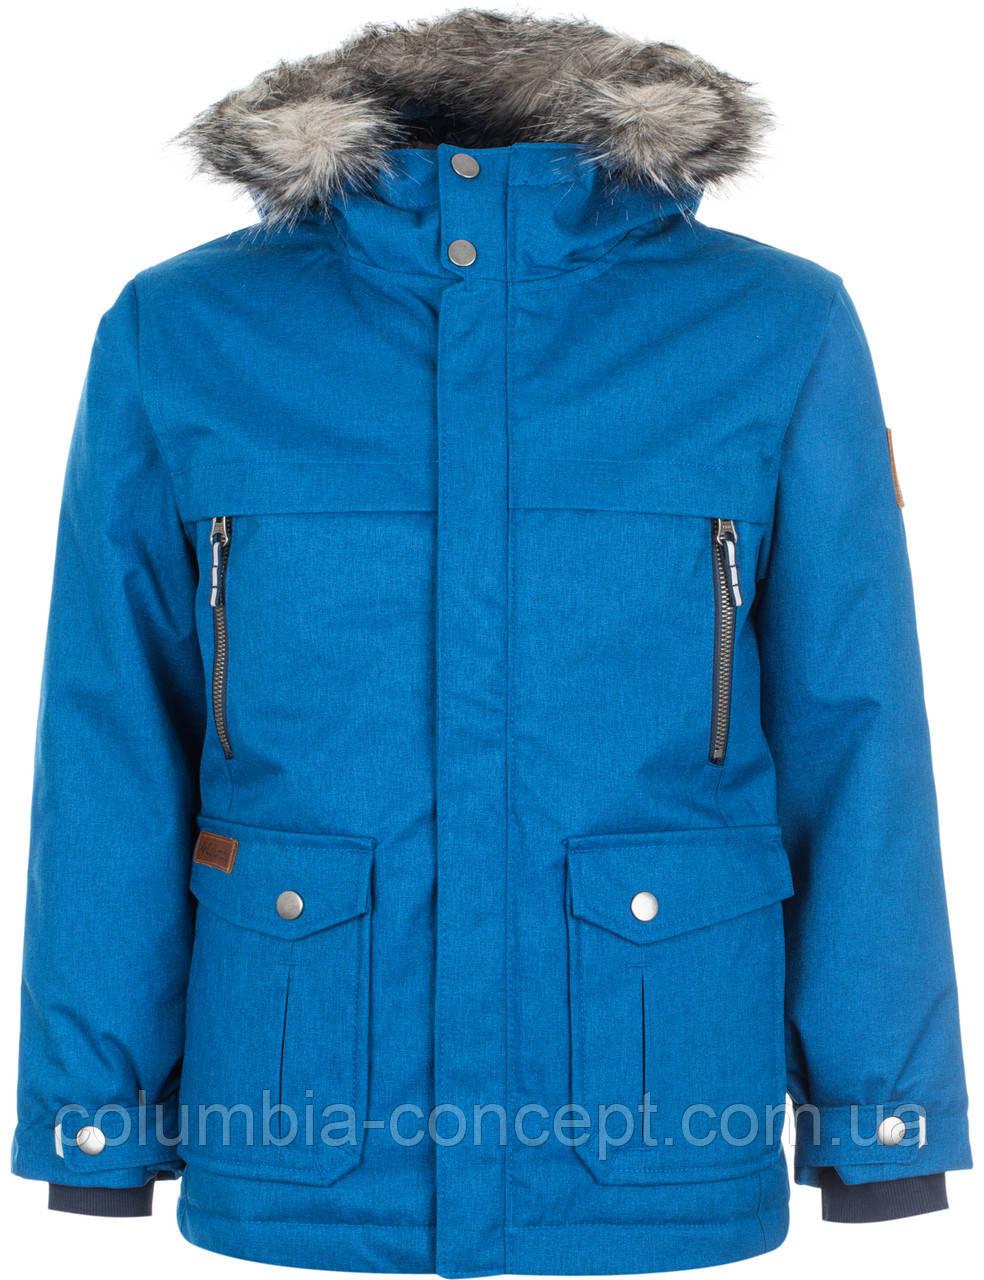 Куртка для Мальчика Columbia BARLOW PASS 600 Turbodown — в Категории ... 20849626dbdcc